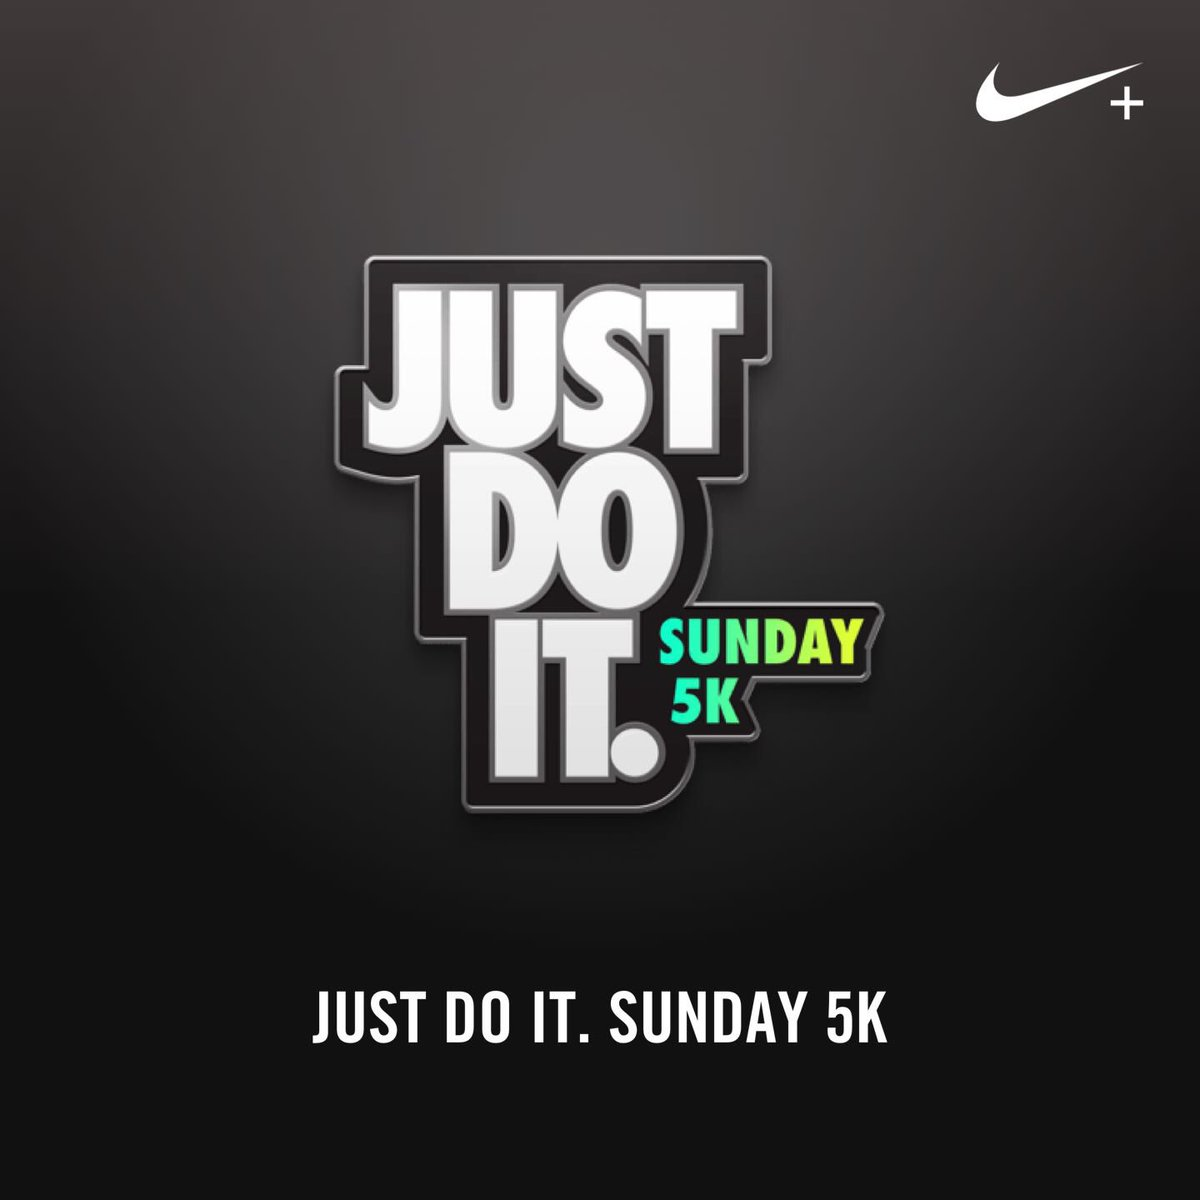 Just did it!  5k Sunday run in the books! #SundayFunday #SundayMorning #SundayWorkout <br>http://pic.twitter.com/UiNqHaE3Gc